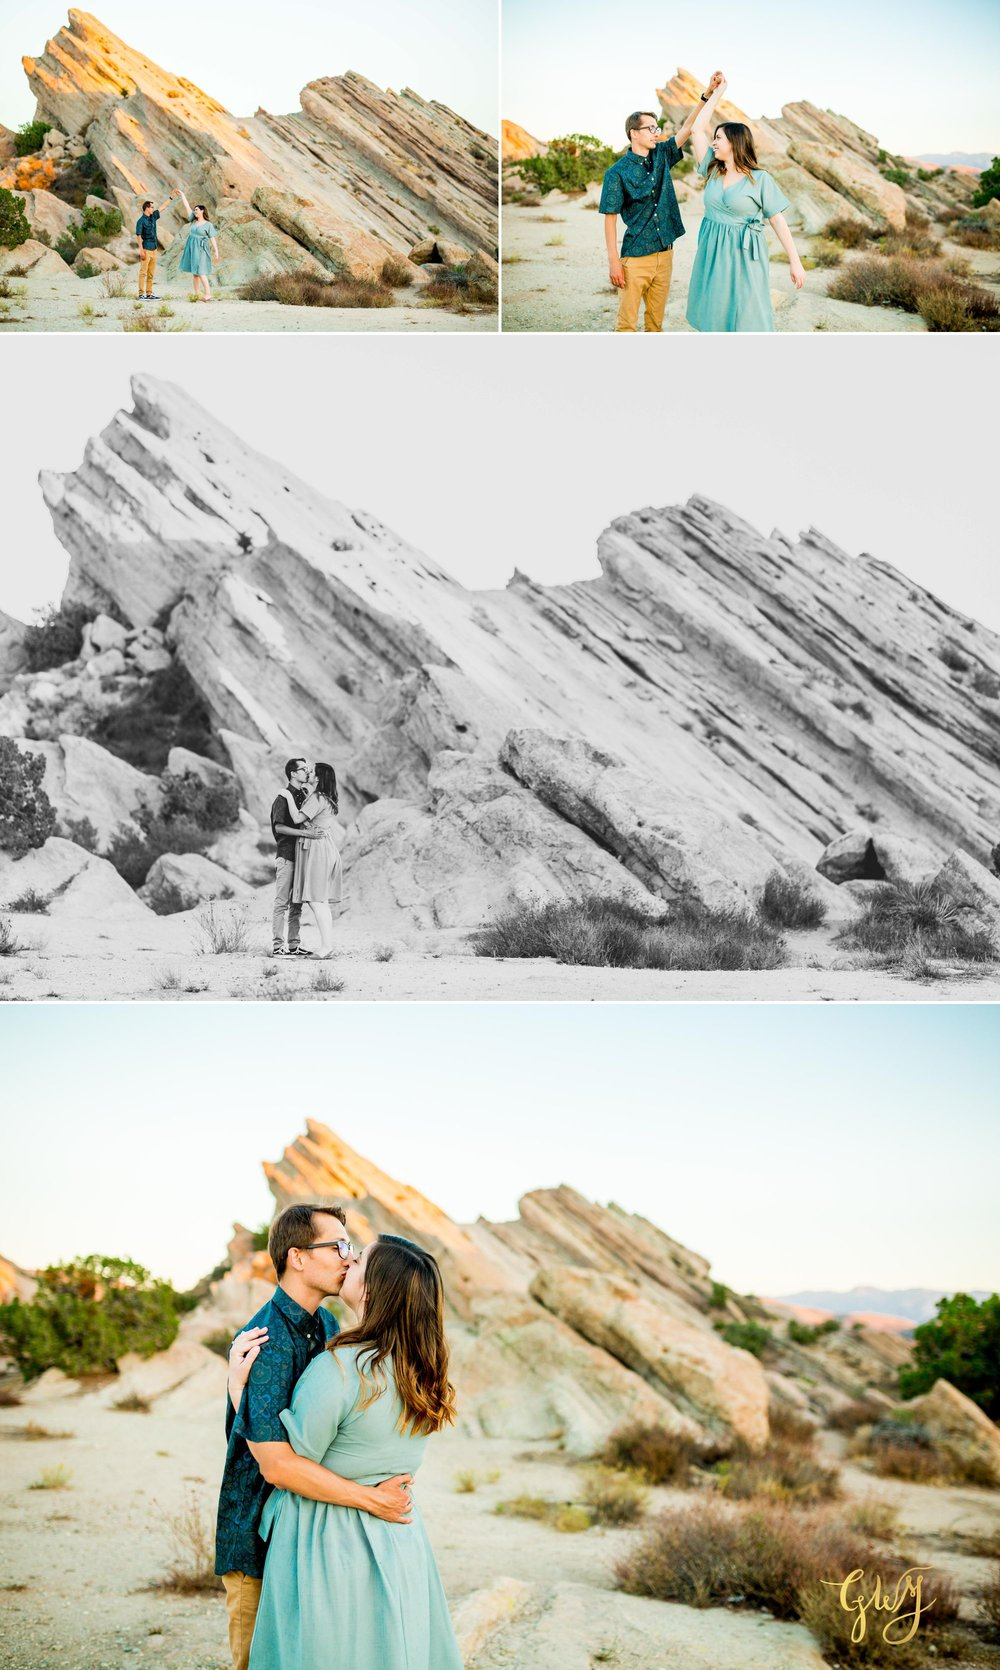 KJ + Maddie Vasquez Rocks Adventurous Hiking Outdoors Engagement Session by Glass Woods Media 10.jpg